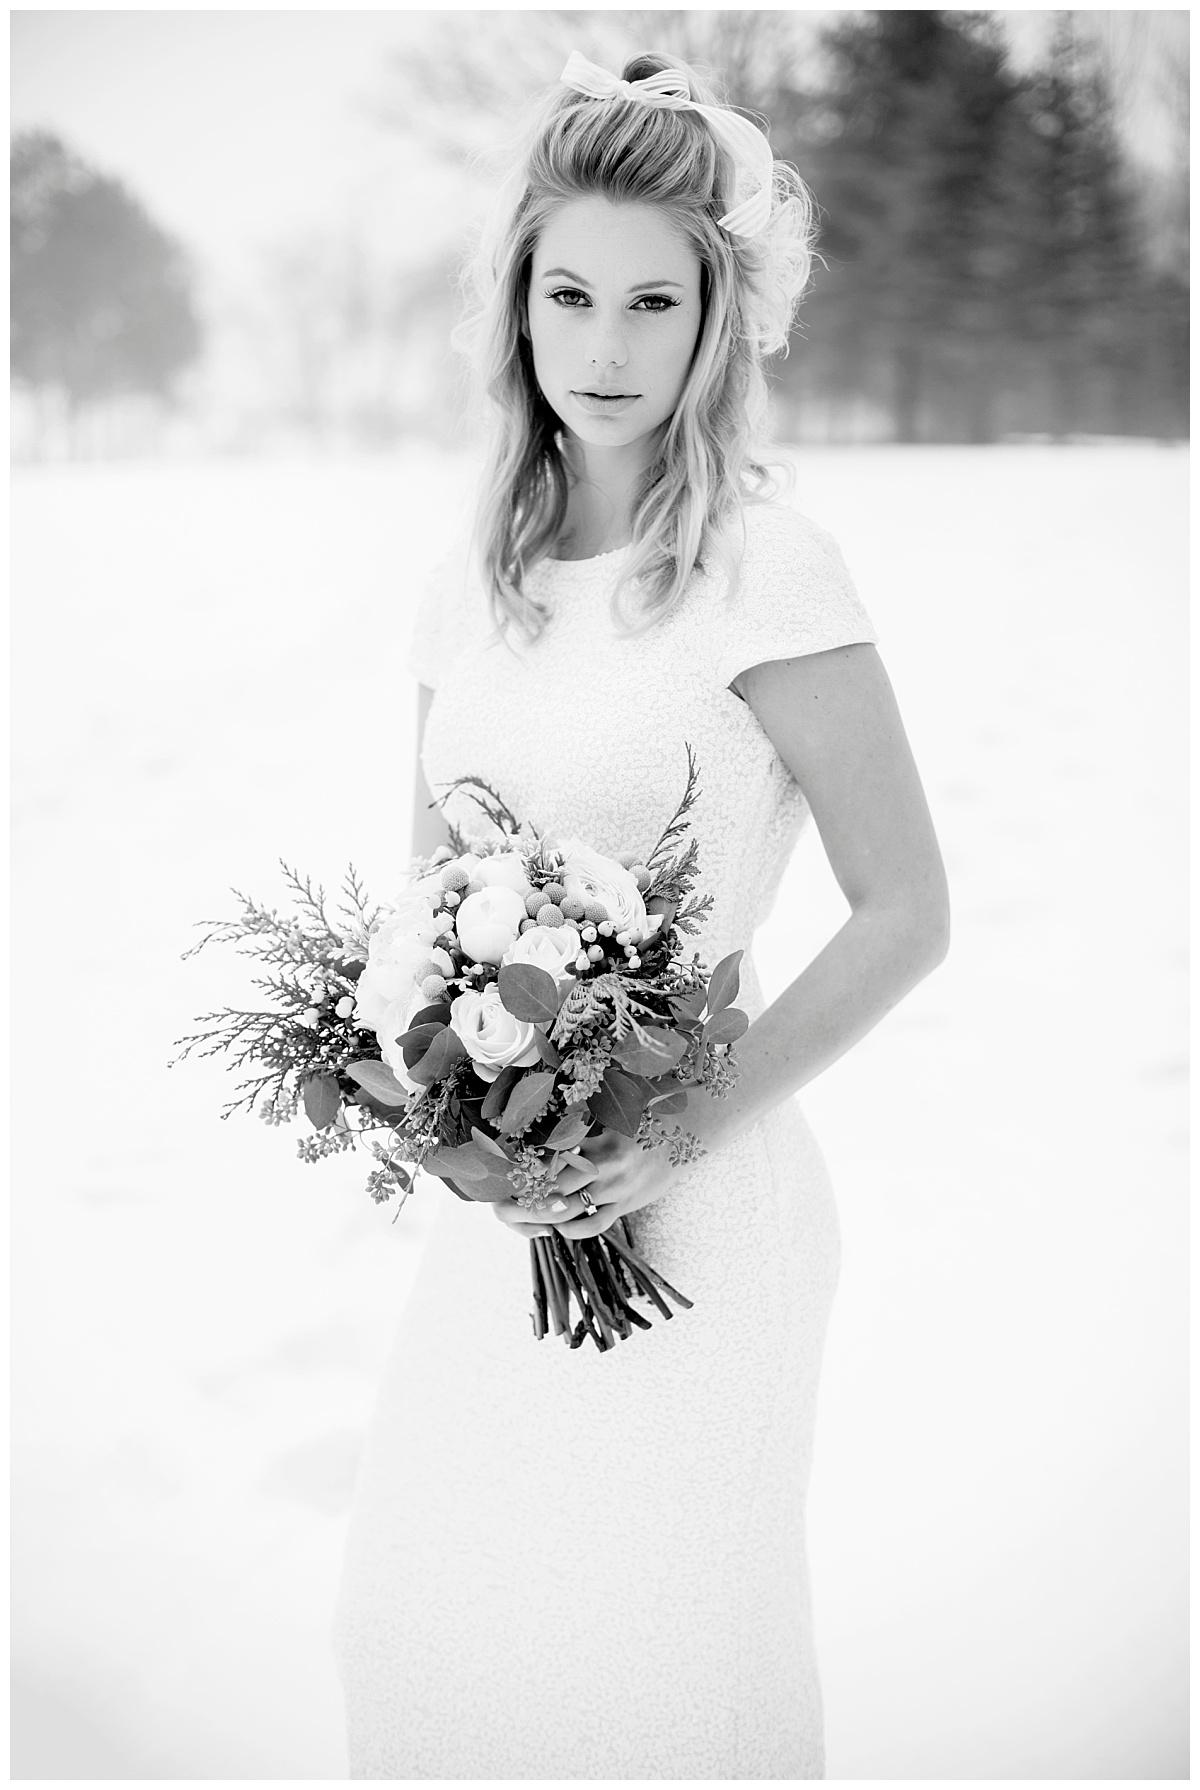 bphotography_winterwedding_siouxfallsweddingphotographer_0028.jpg